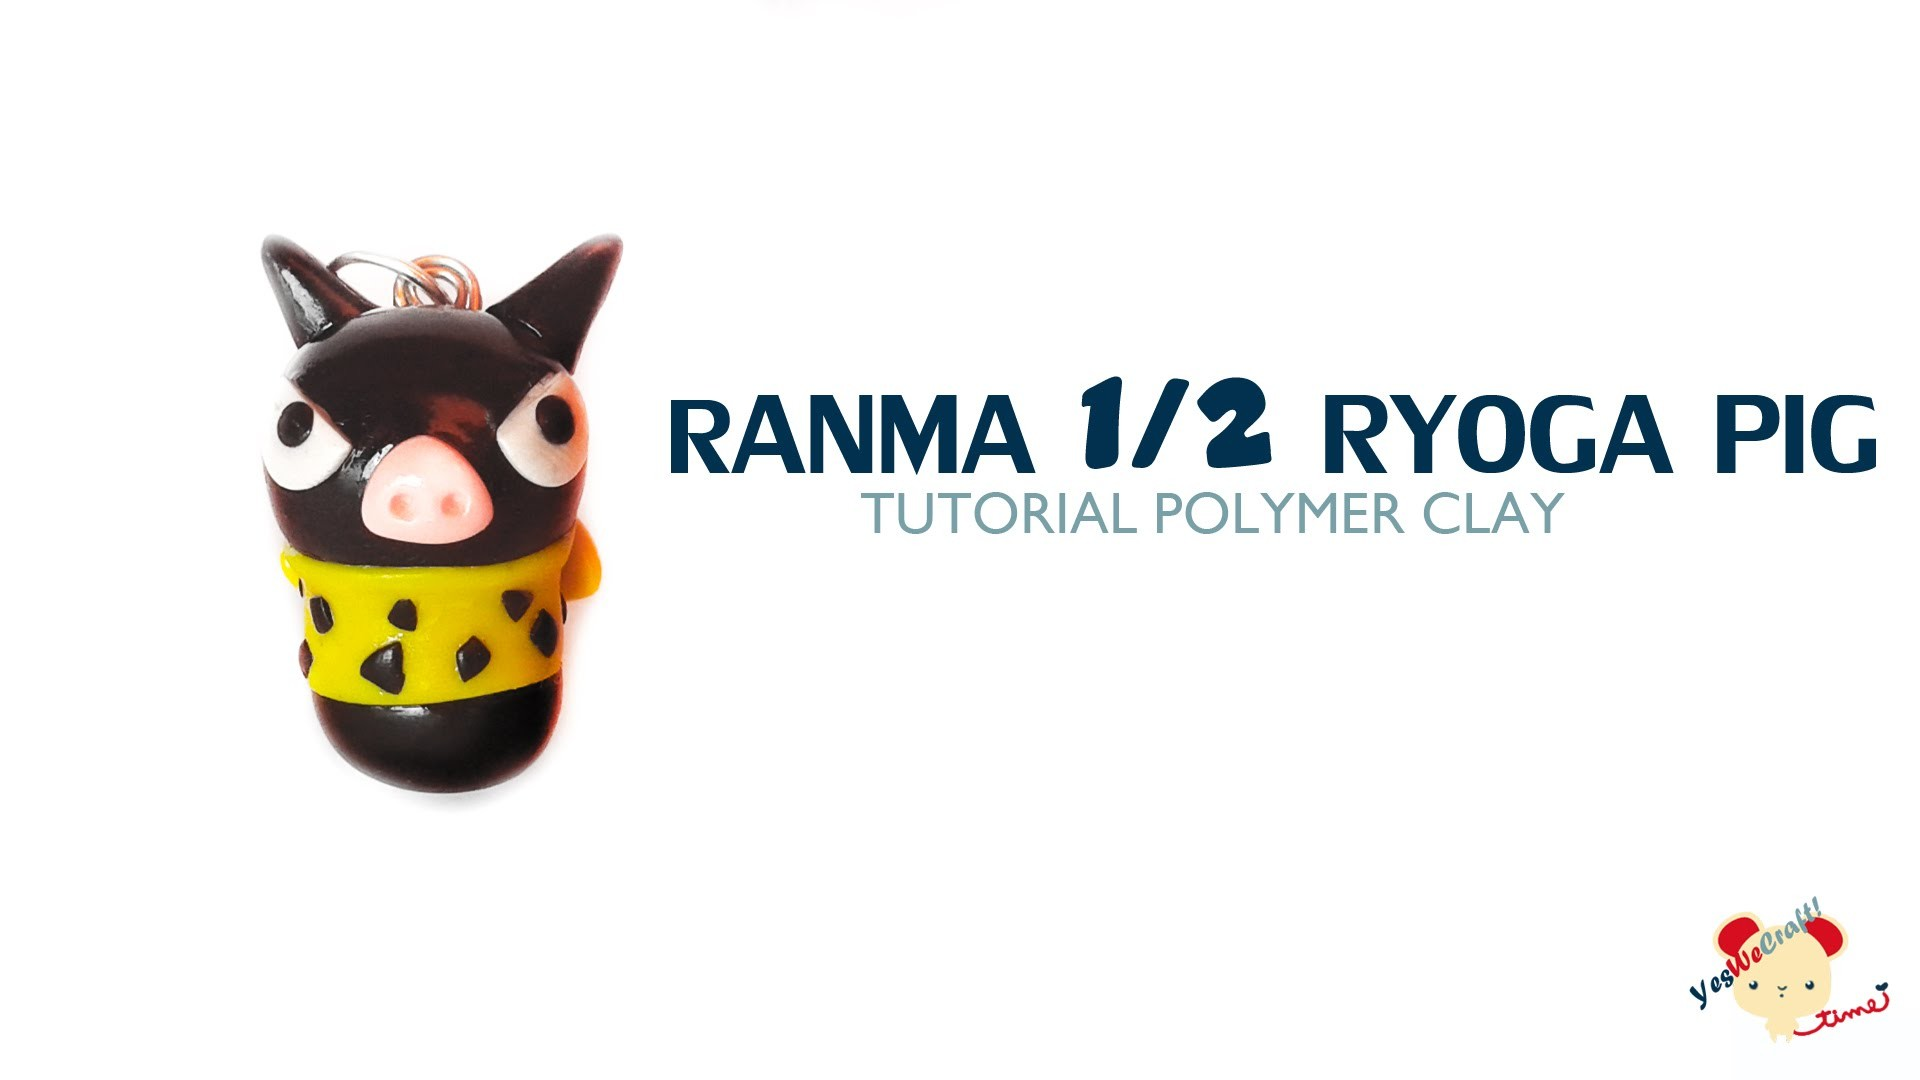 Ryoga Pig Ranma Polymer Clay Turorial. Cerdito Ryoga  de Arcilla Polimérica